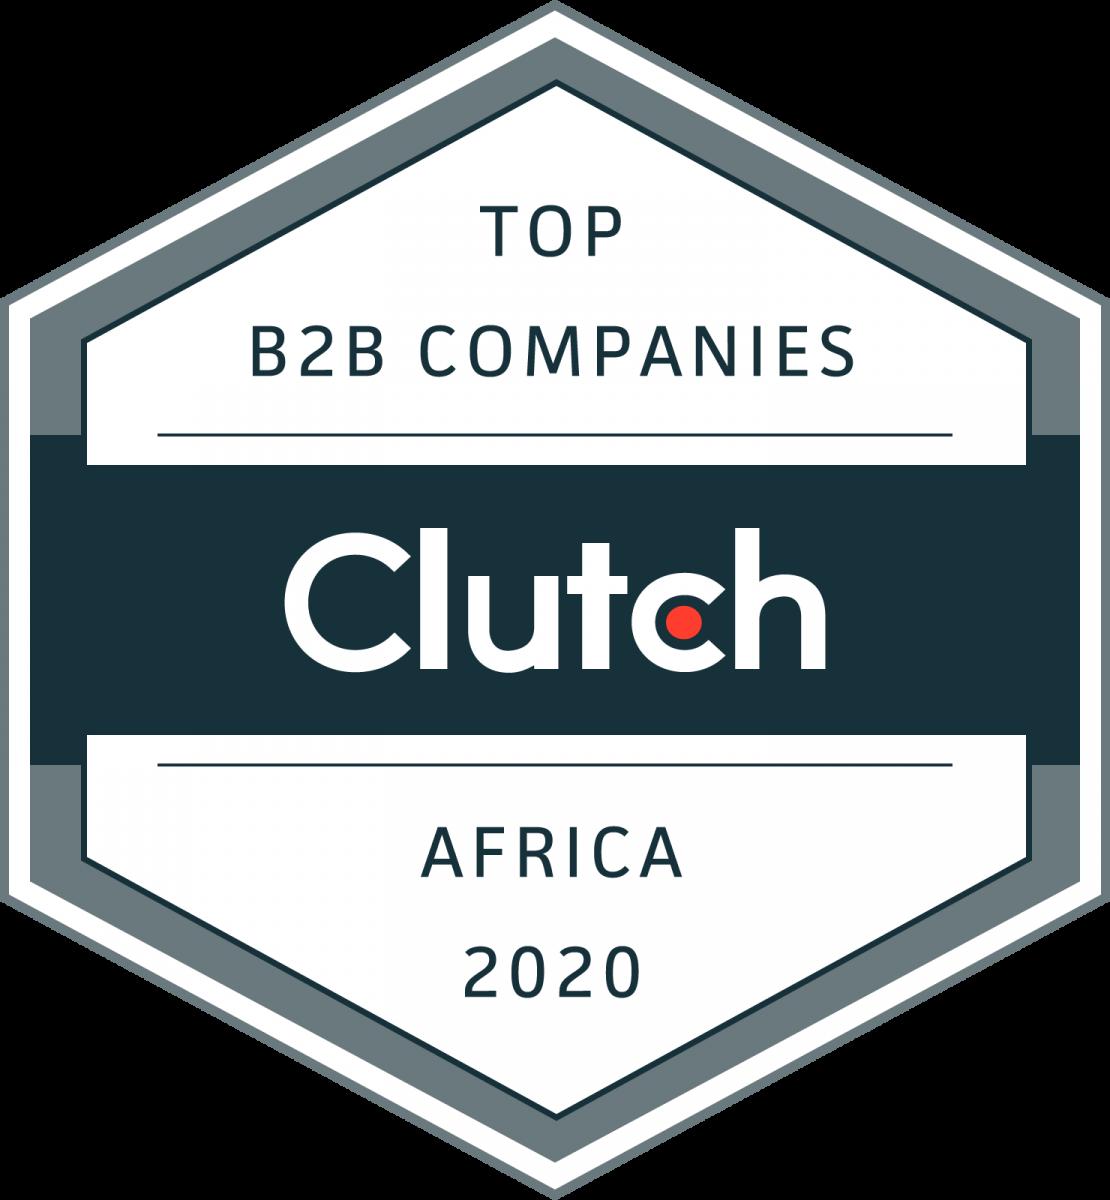 Top B2B Companies Africa 2020